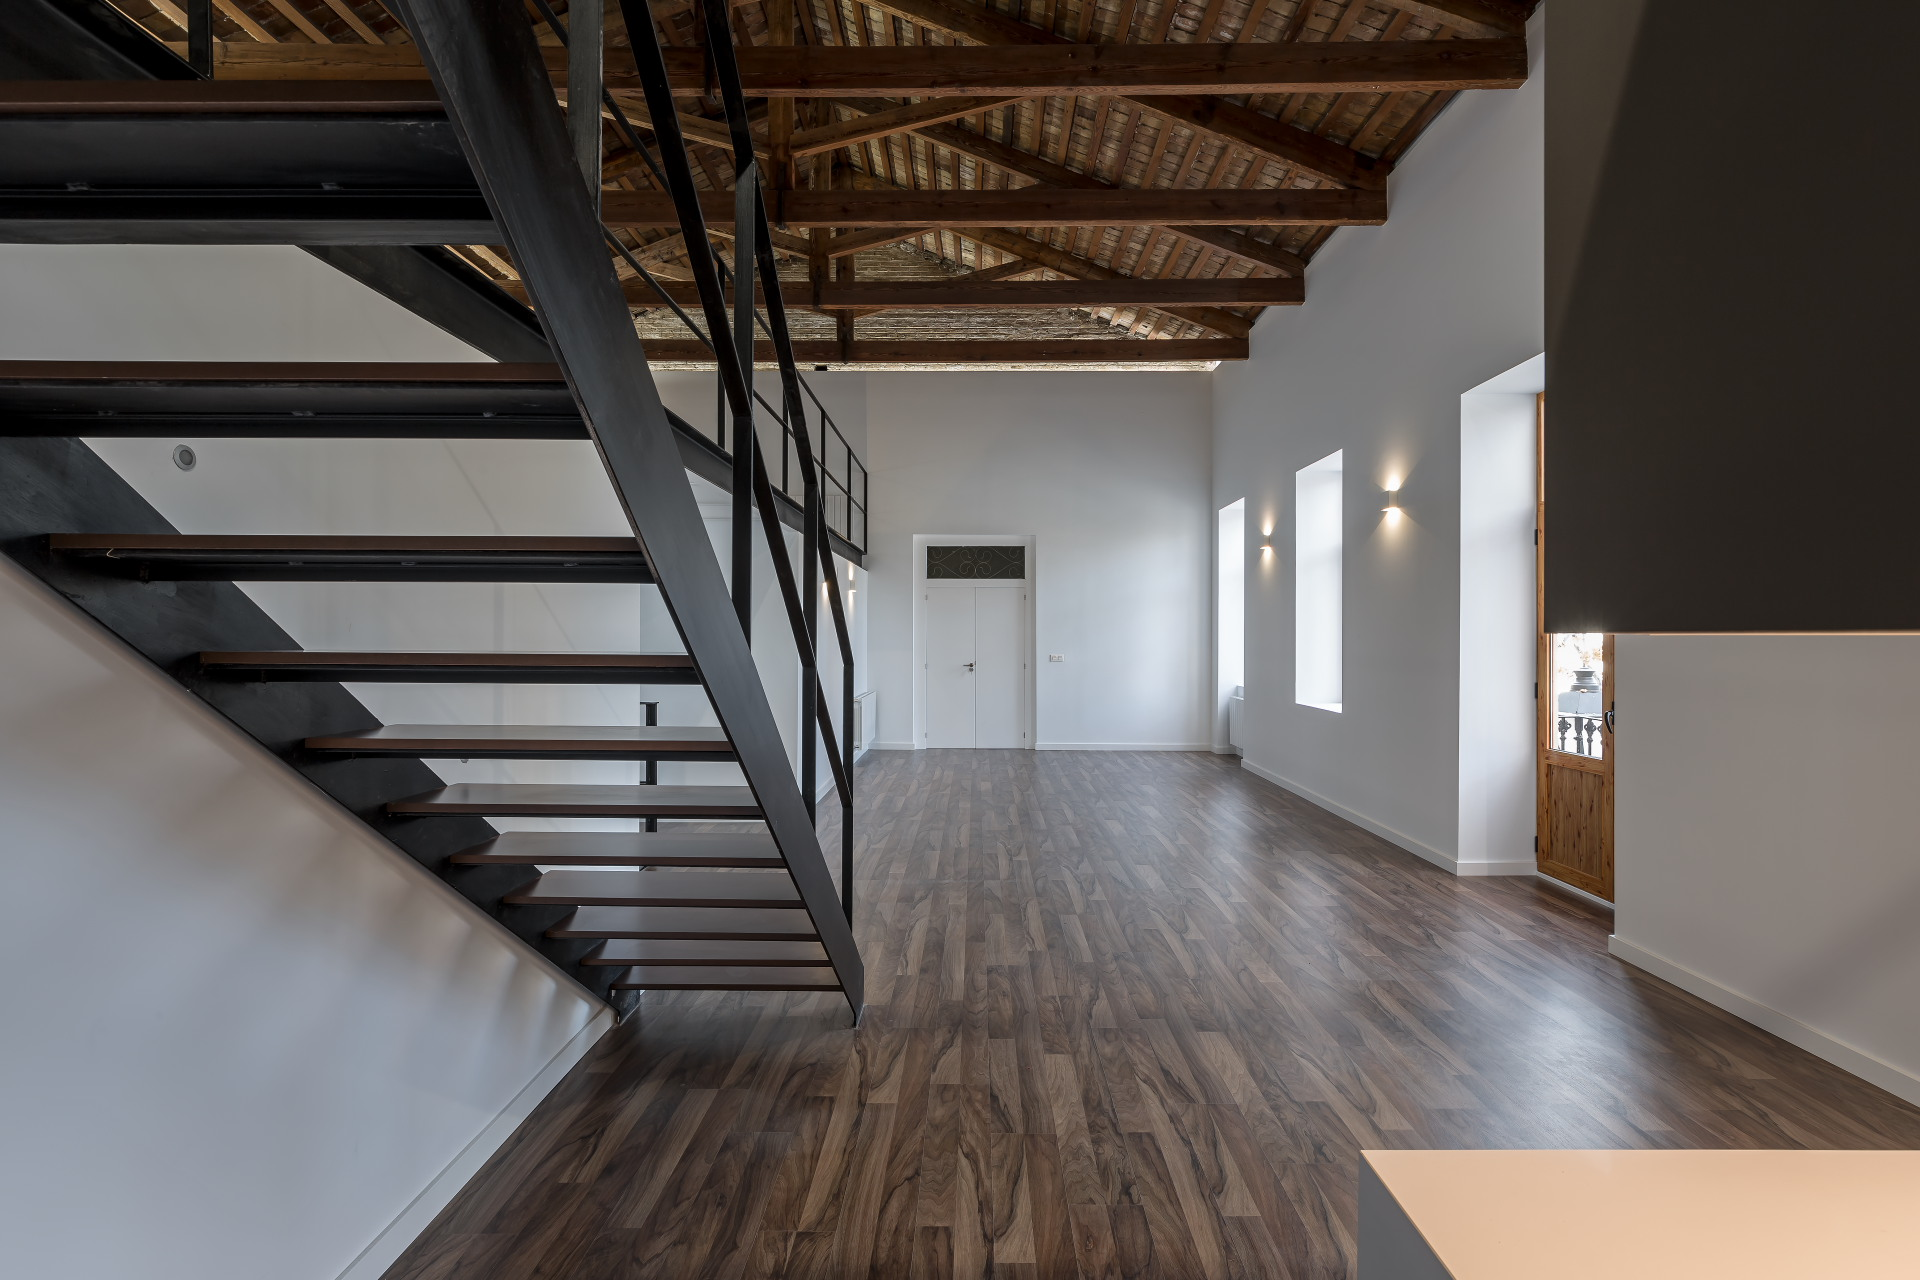 fotografia-arquitectura-valencia-german-cabo-viraje-rehabilitacion-campanar (20)